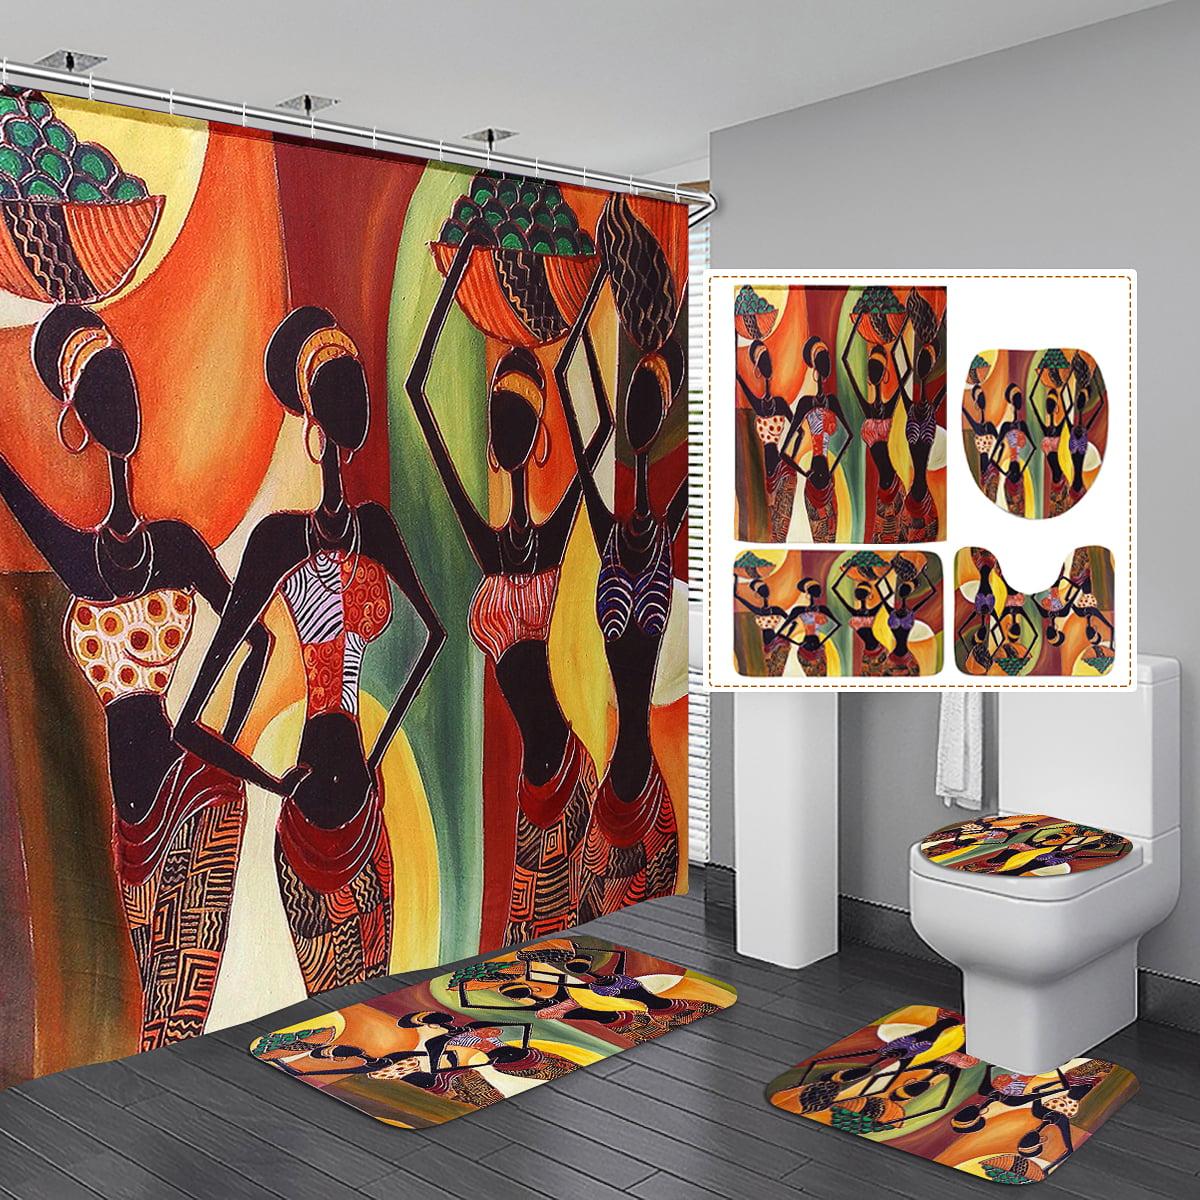 African Woman Waterproof Polyester Shower Curtain Art Decor Afrocentric In Tribal Dresses 60 X 72 Walmart Com Walmart Com